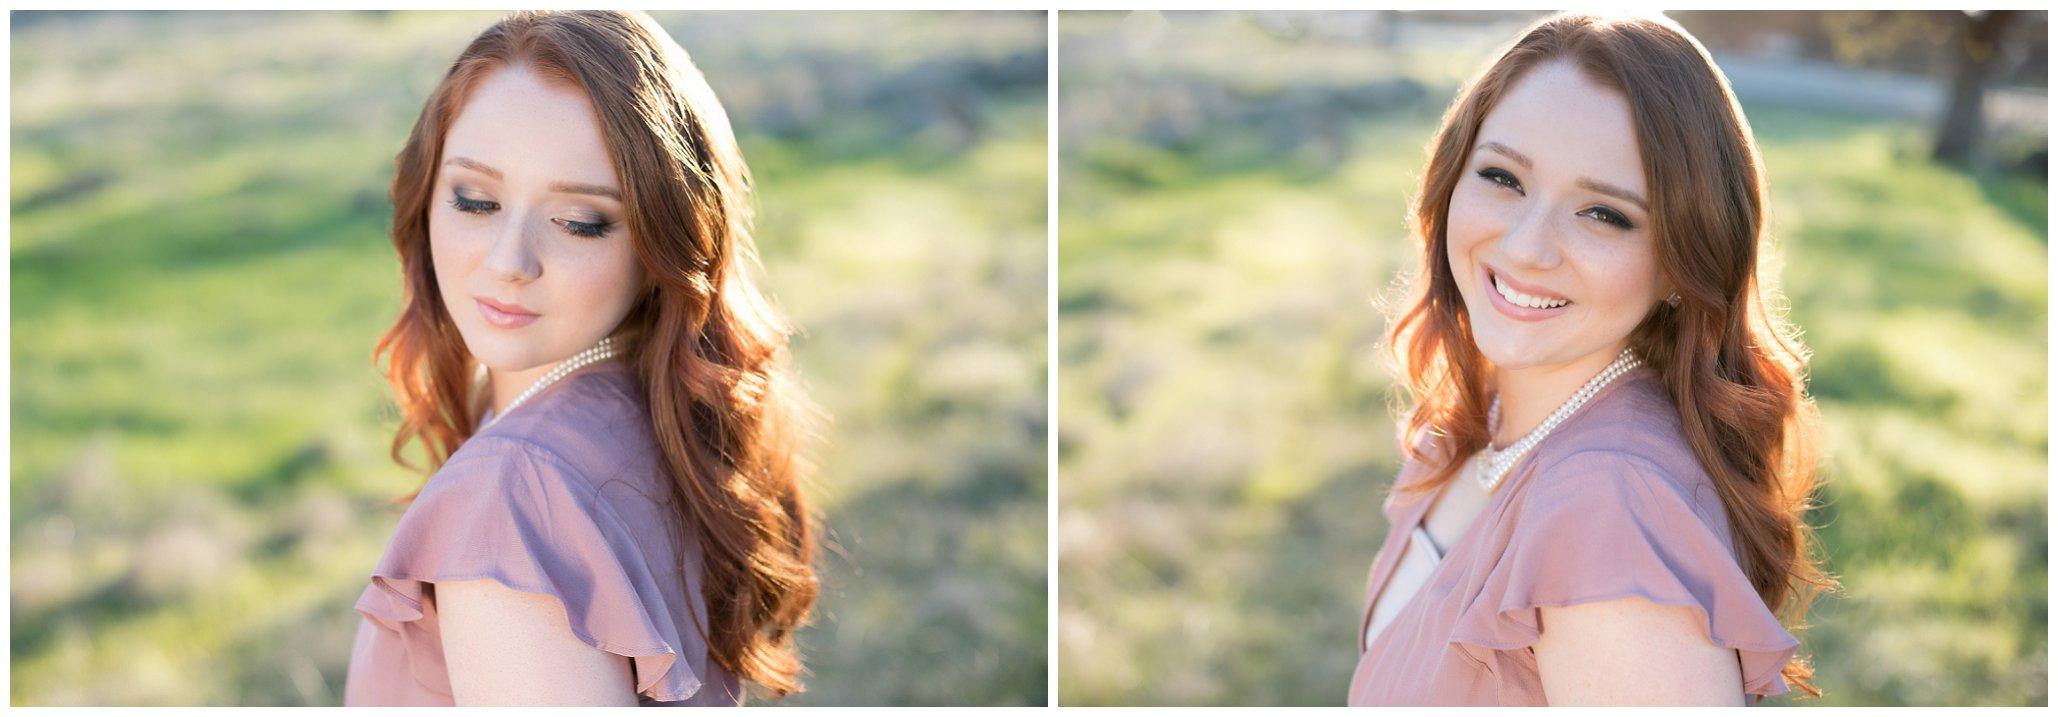 redhead-senior-portraits-del-campo-high-school_0242.jpg